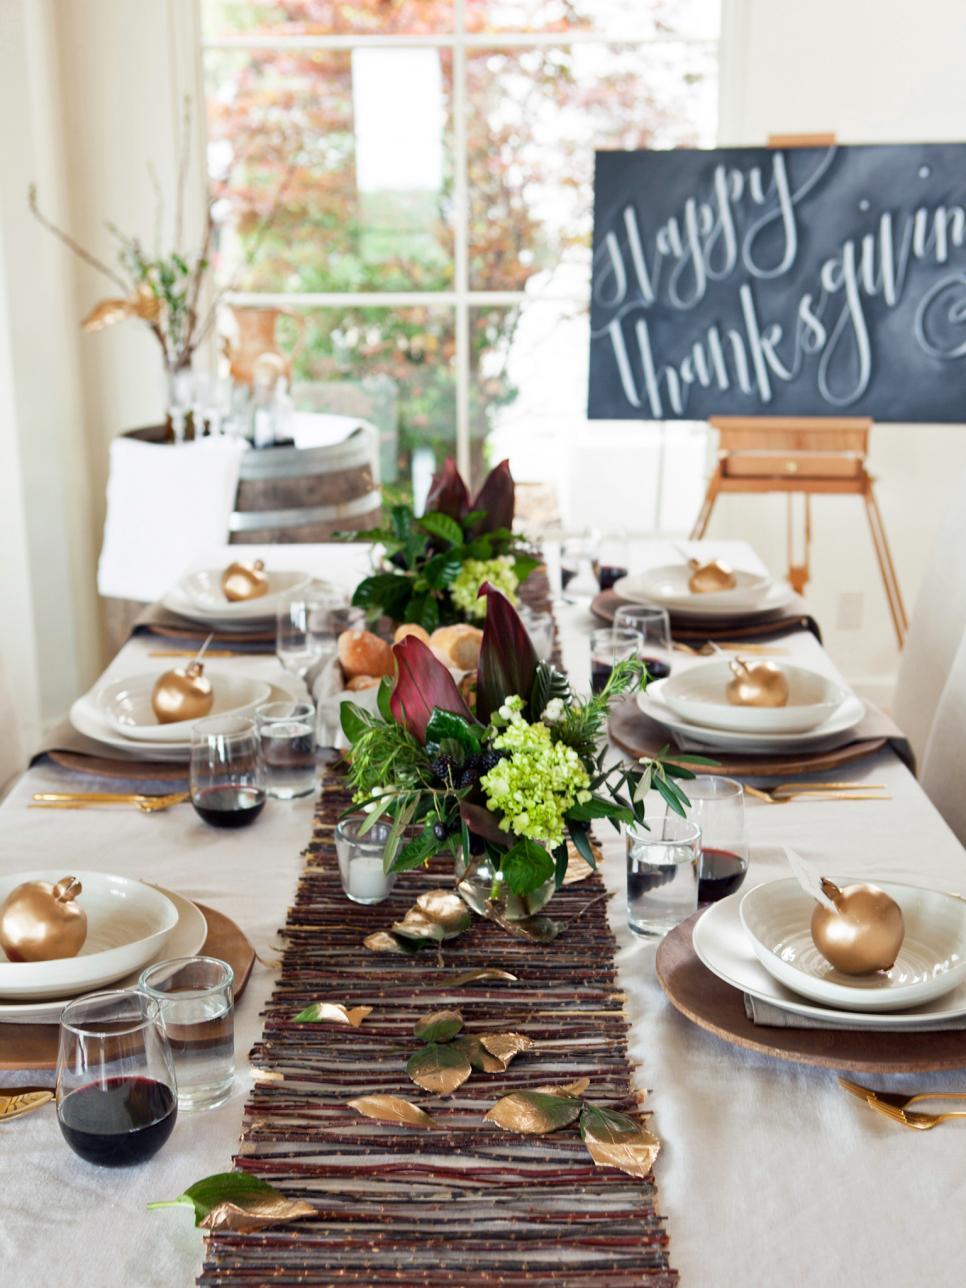 Creative Ideas For A Boho Rustic Tablescape